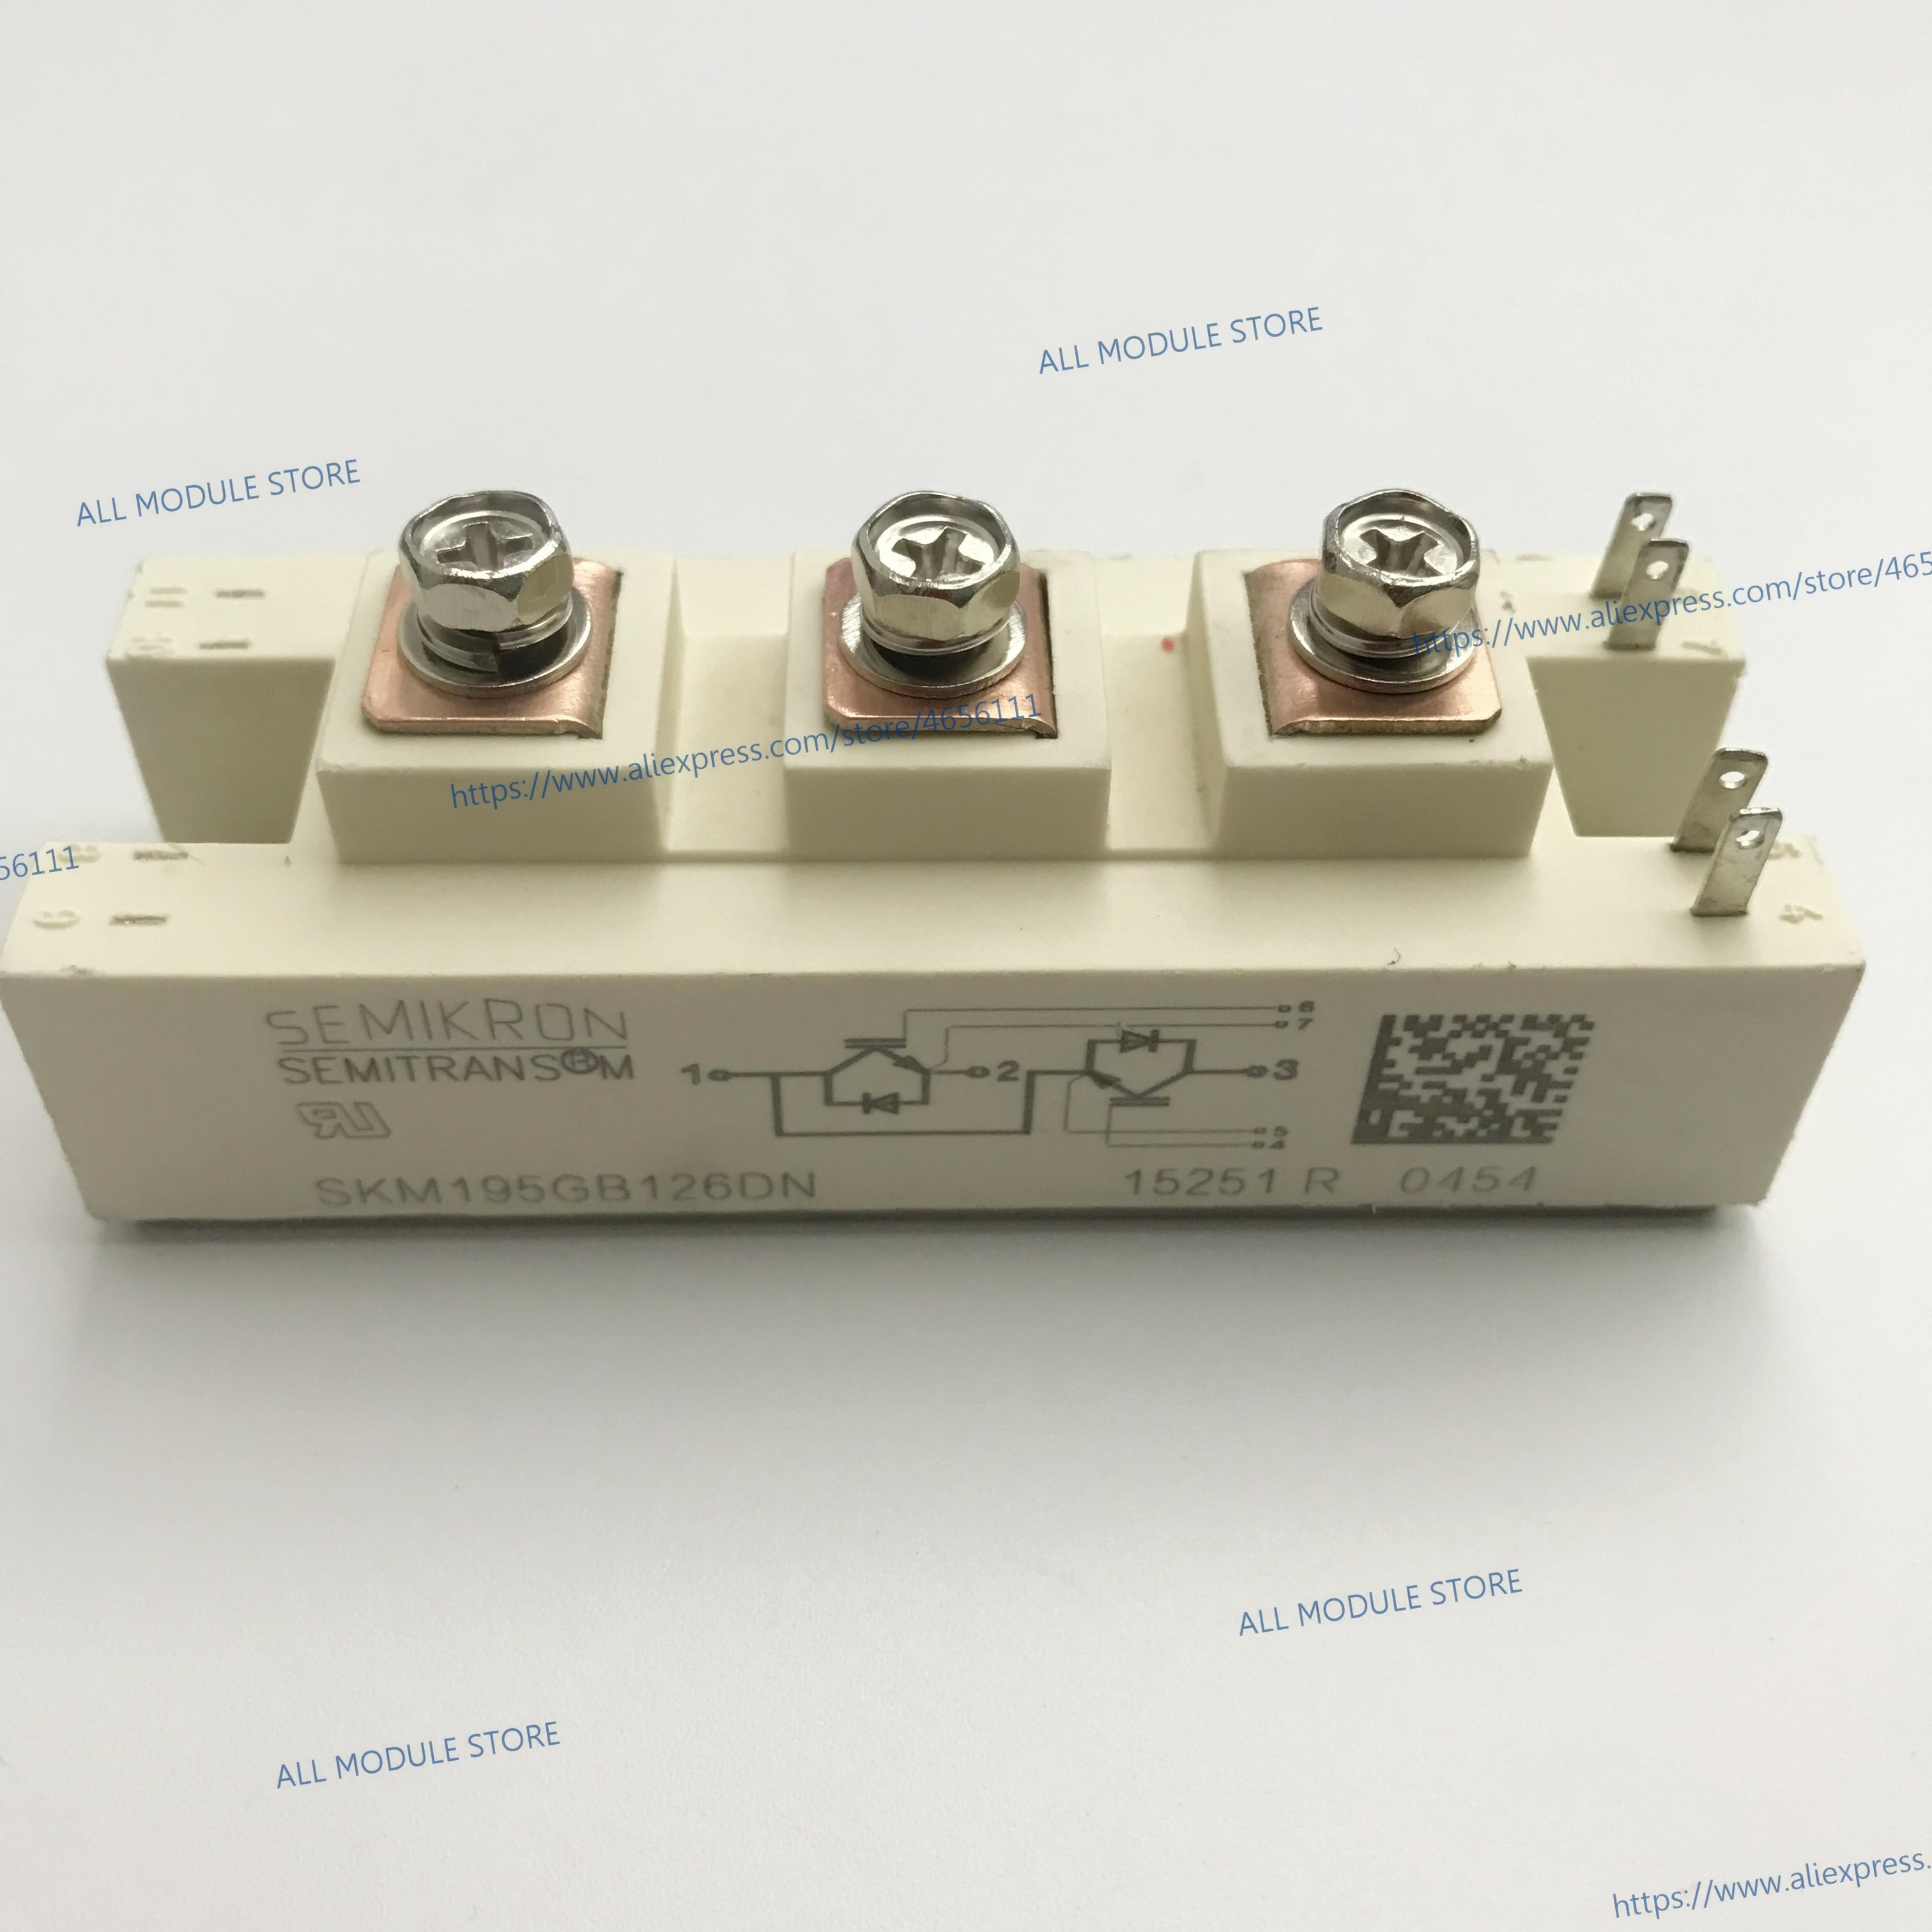 SKM195GB126DN FREE SHIPPING NEW IGBT MODULE